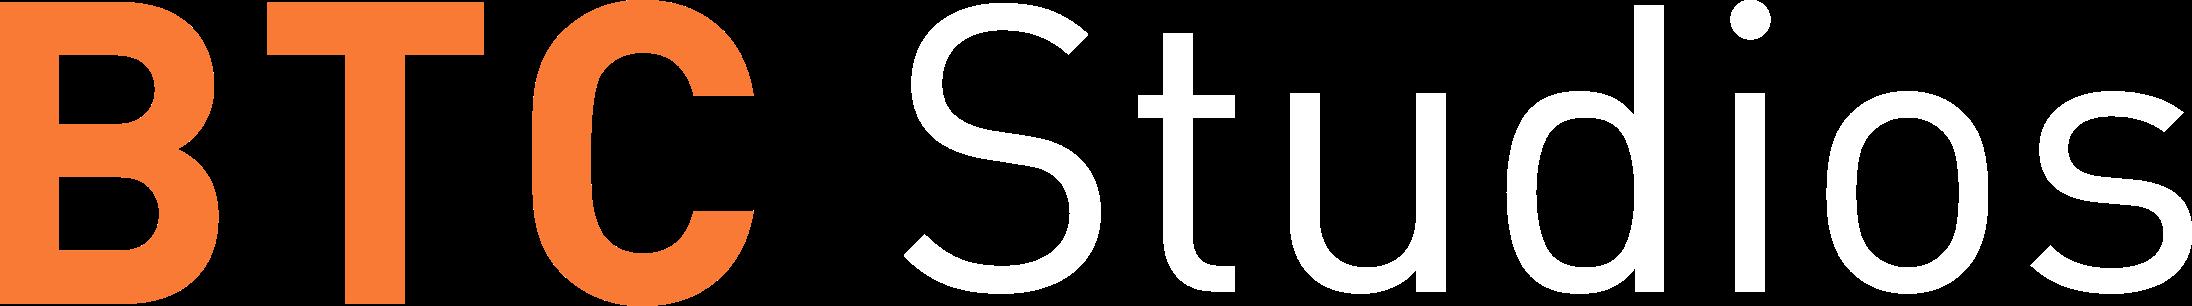 BTC STUDIOS